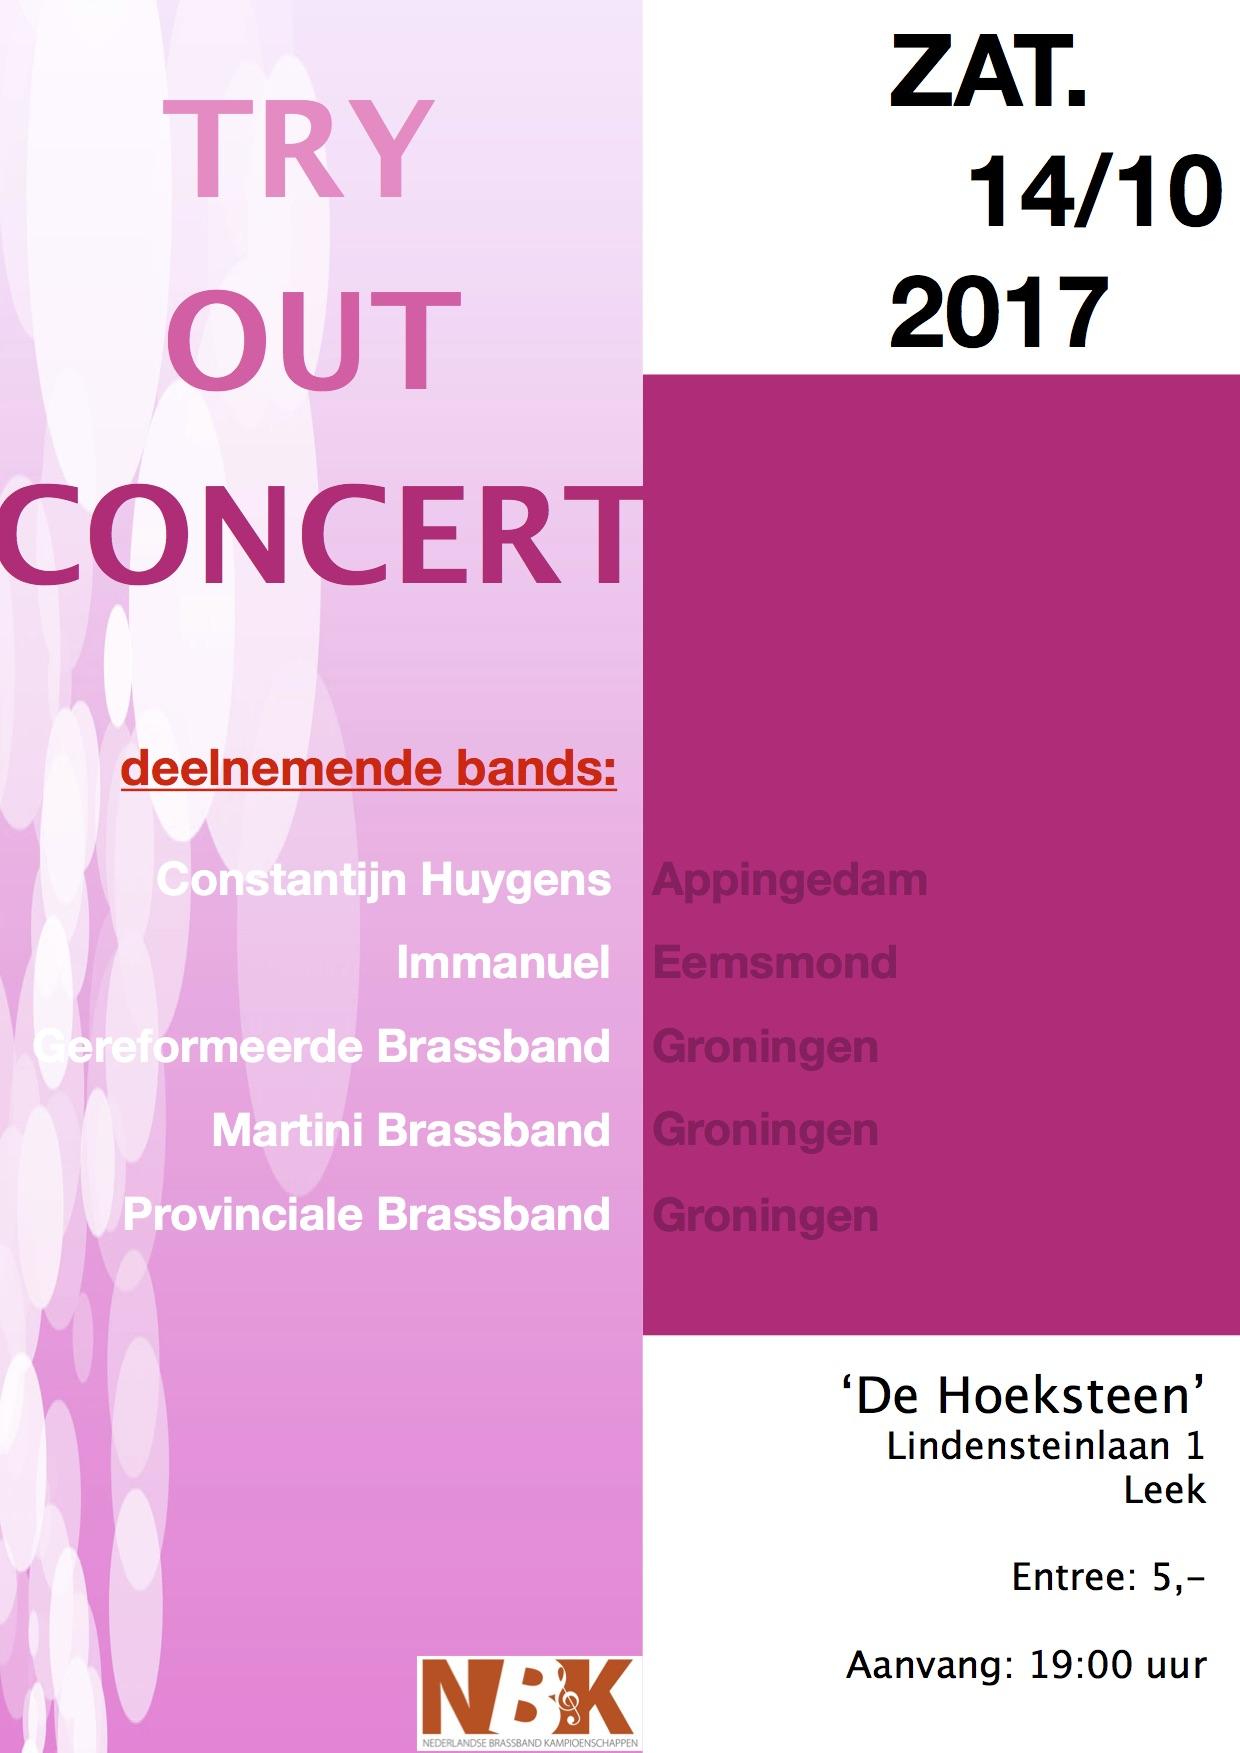 poster-groninger-bands-2017.jpg#asset:525